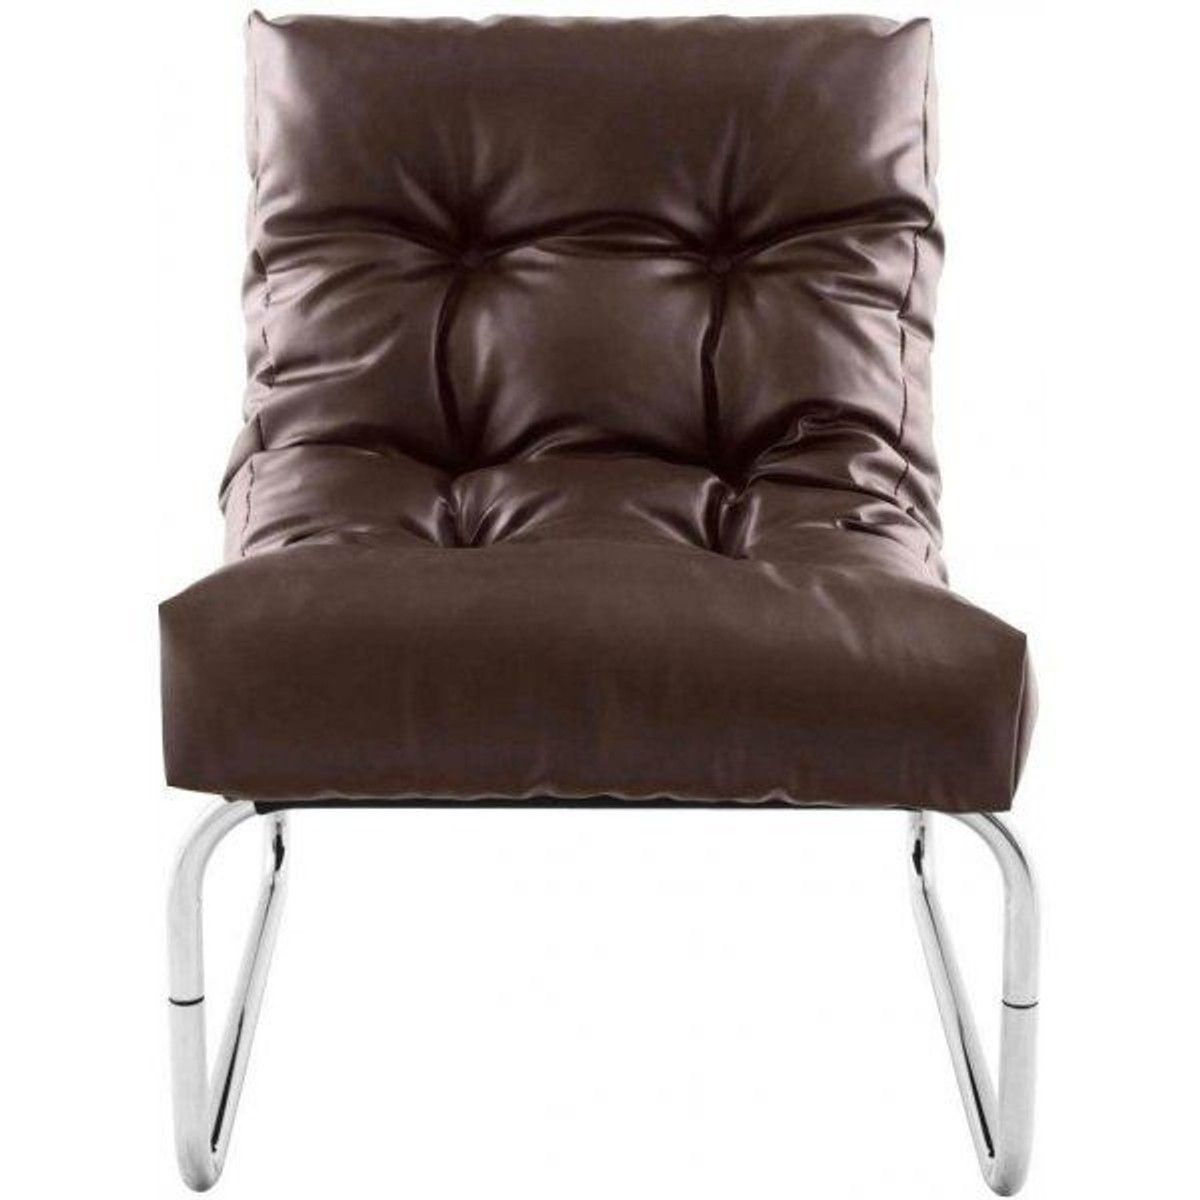 Entre les spheres de linfini lœuvre dophira grosfeld living kokoon boudoir designproducts roomhome fauteuil gifyyvb76